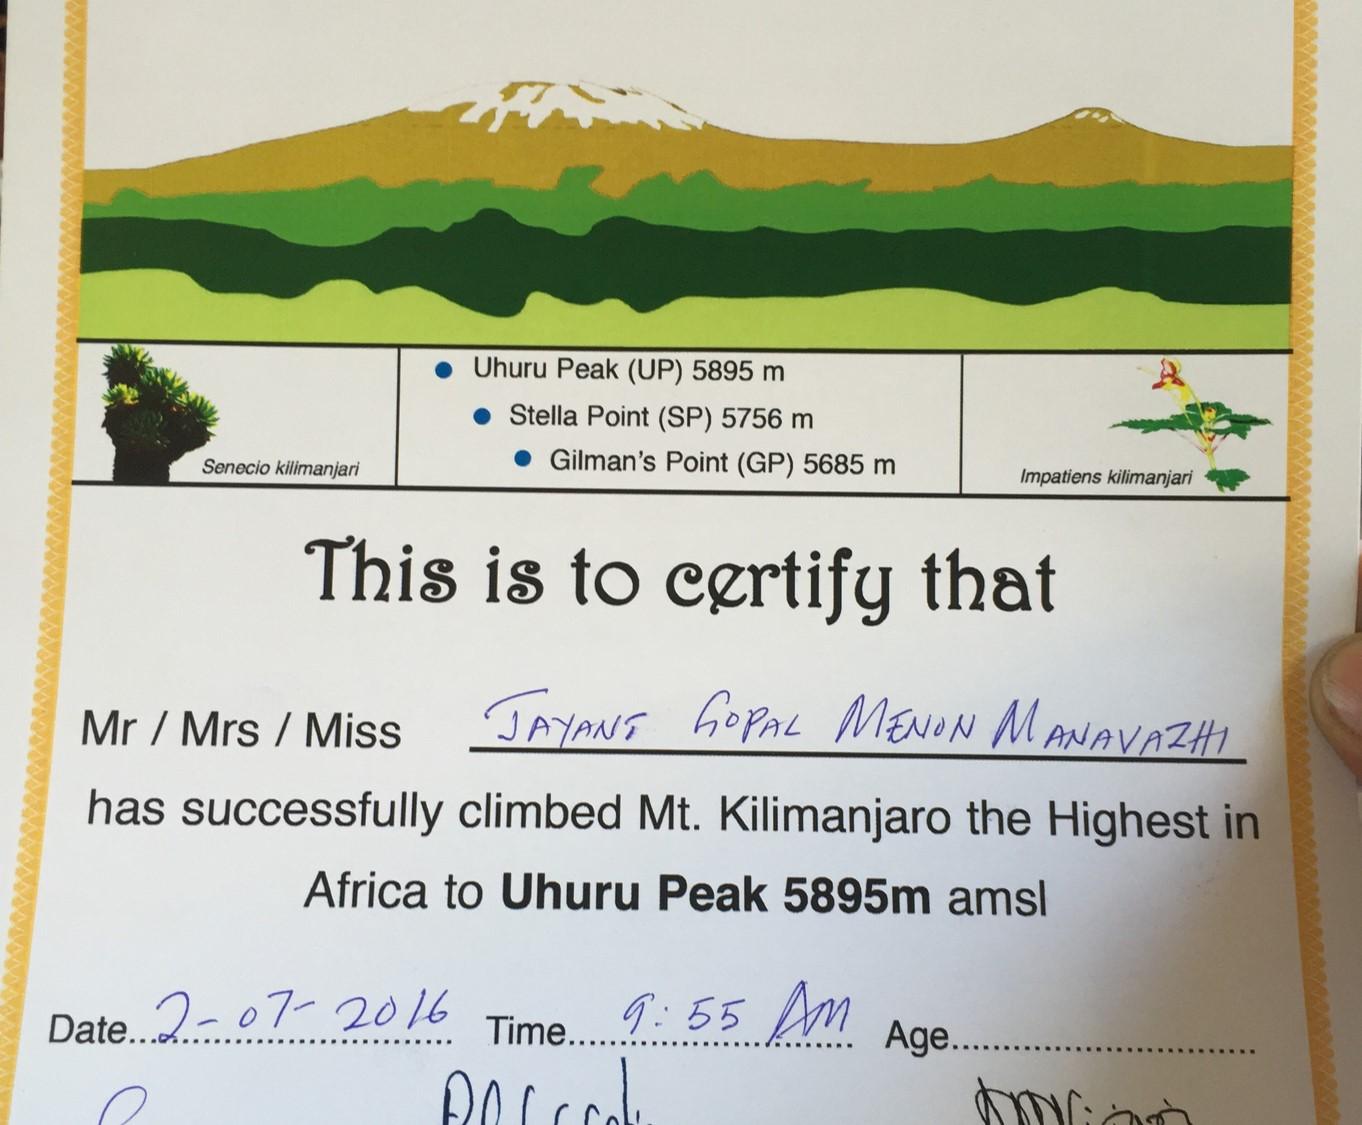 American_University_of_Sharjah_Kilimanjaro_-_50.jpg